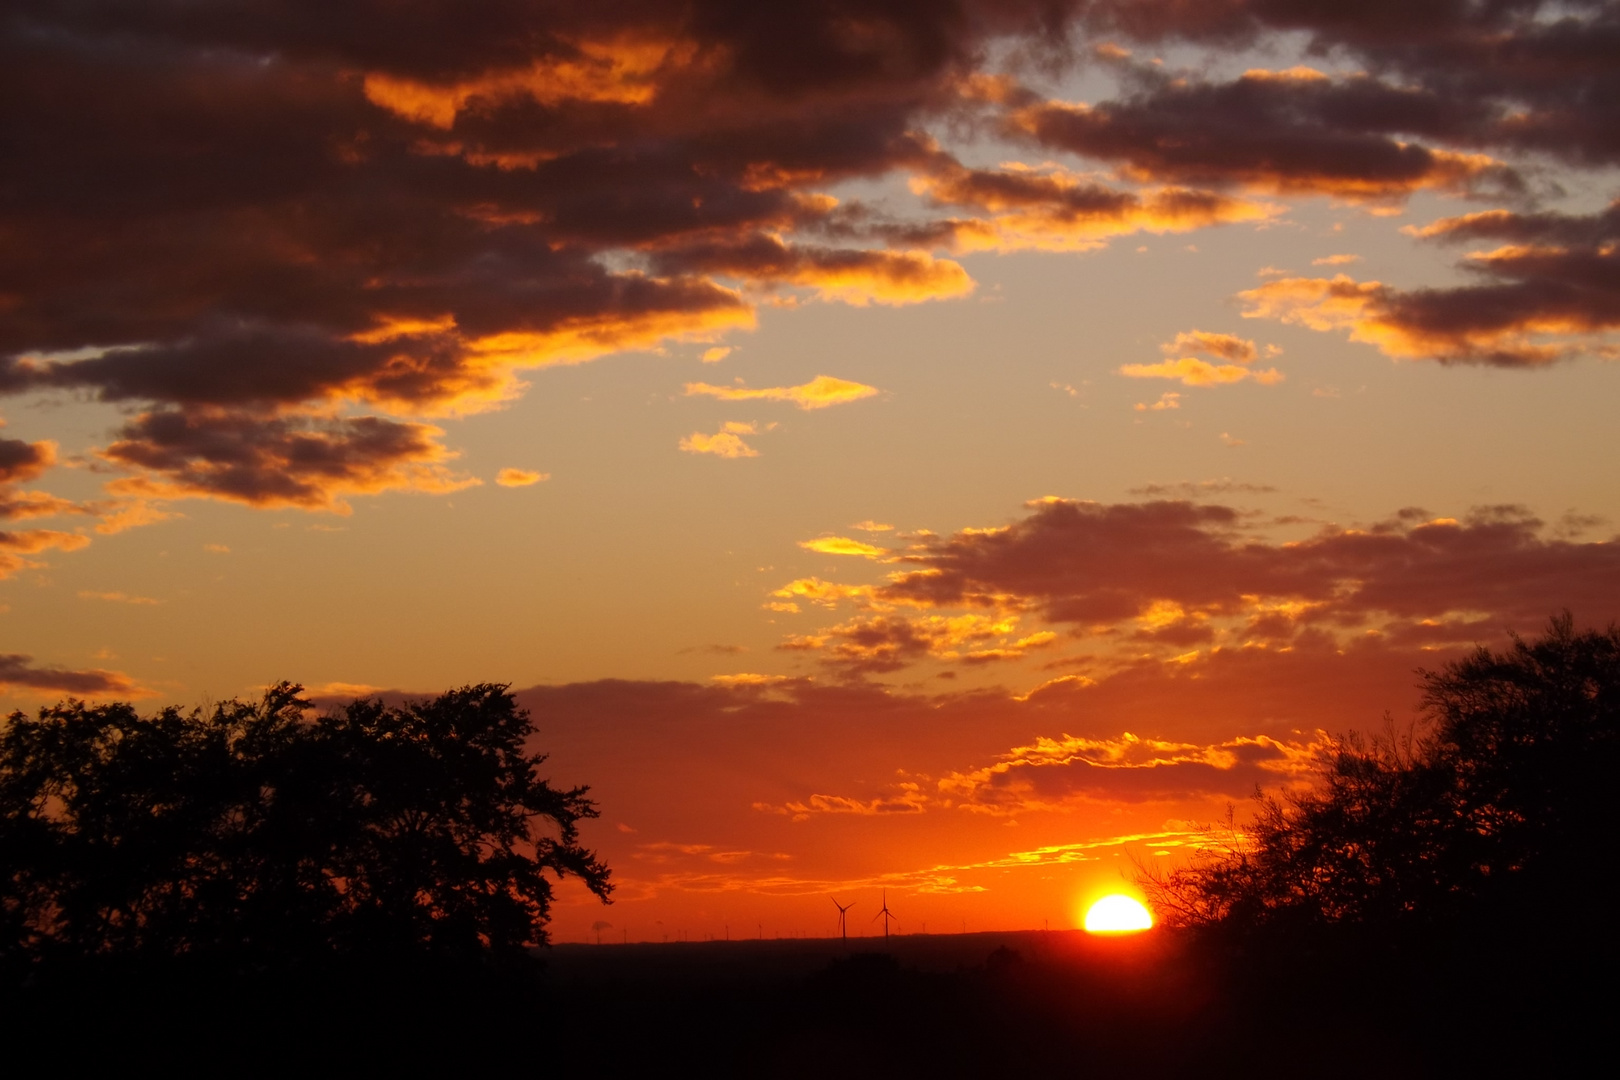 Sonnenuntergang am 26.10.2013